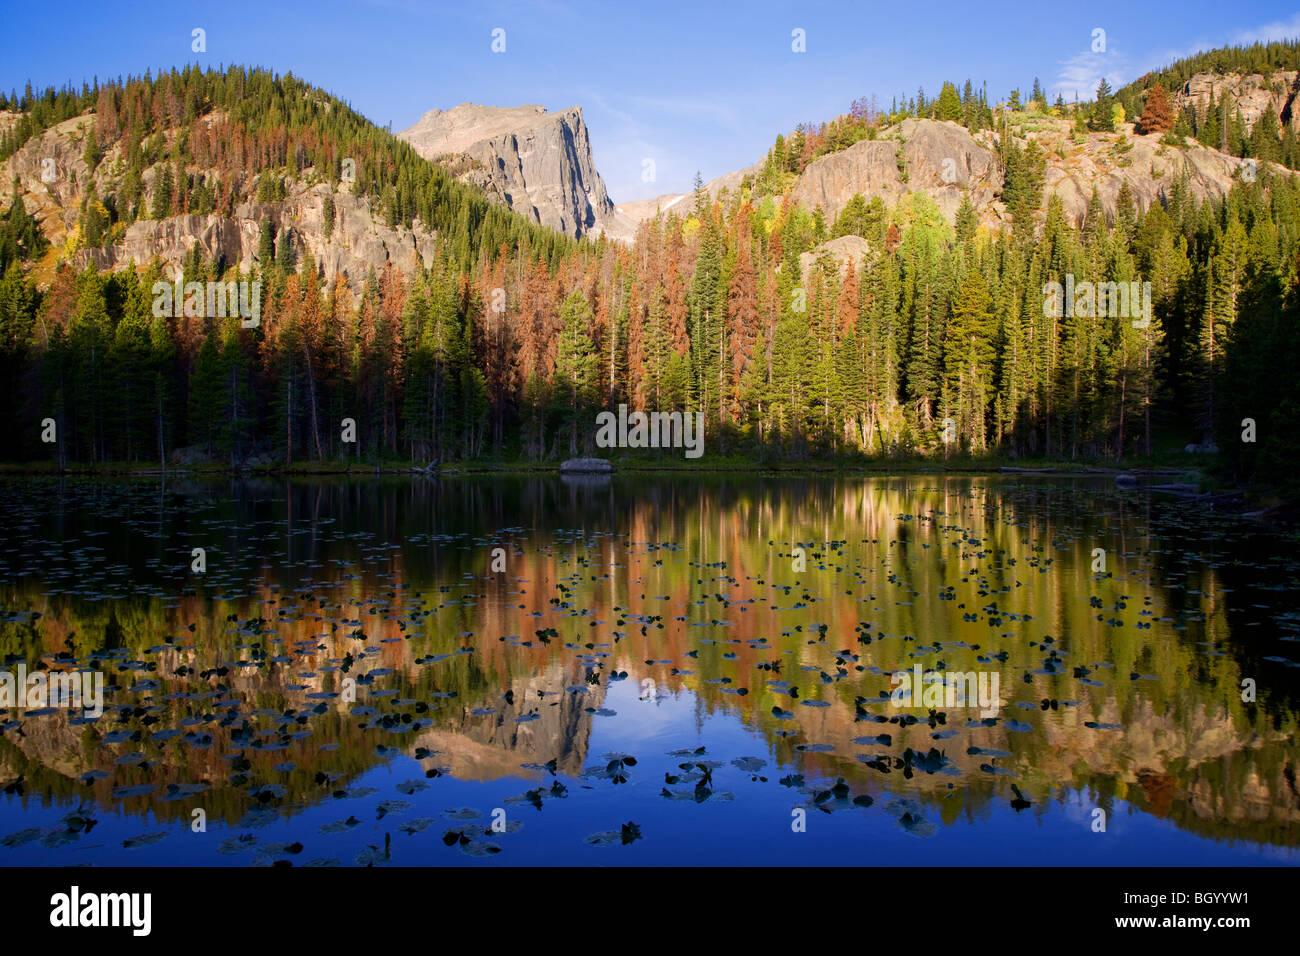 Nymph Lake, Rocky Mountain National Park, Colorado. - Stock Image